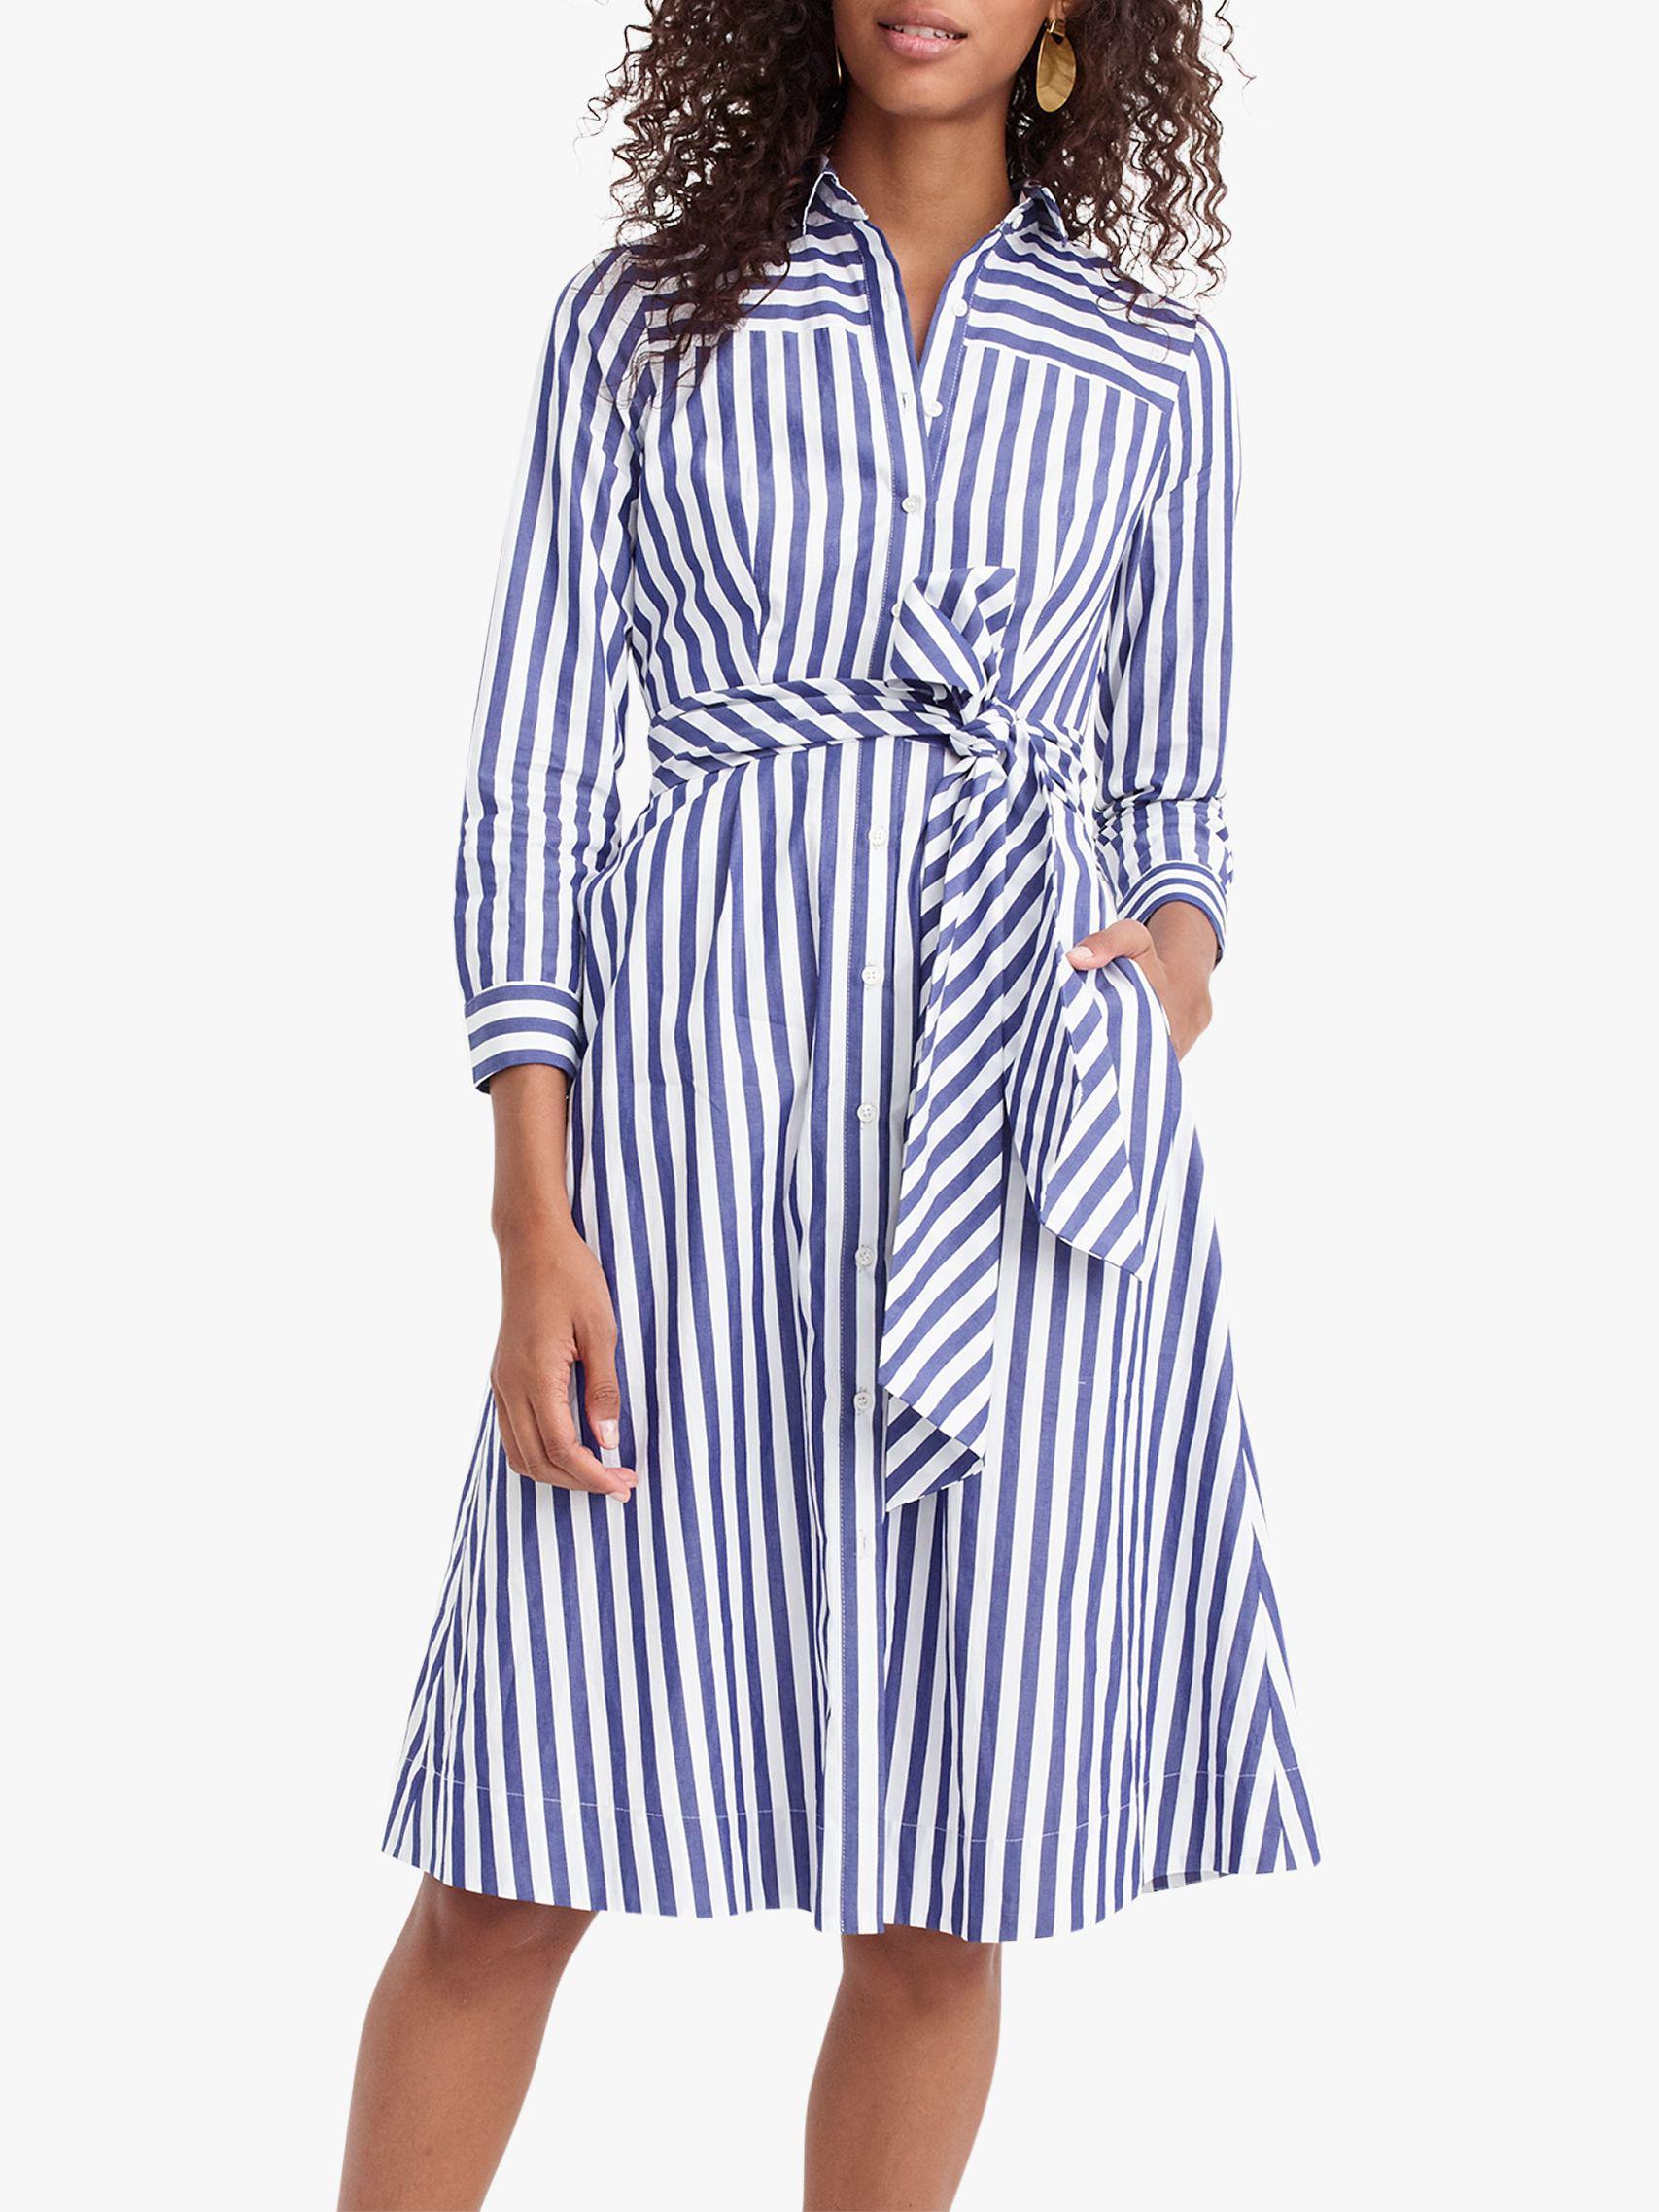 3c18657a607 J.Crew Sybil Tie Waist Shirt Dress in Blue - Save 60% - Lyst